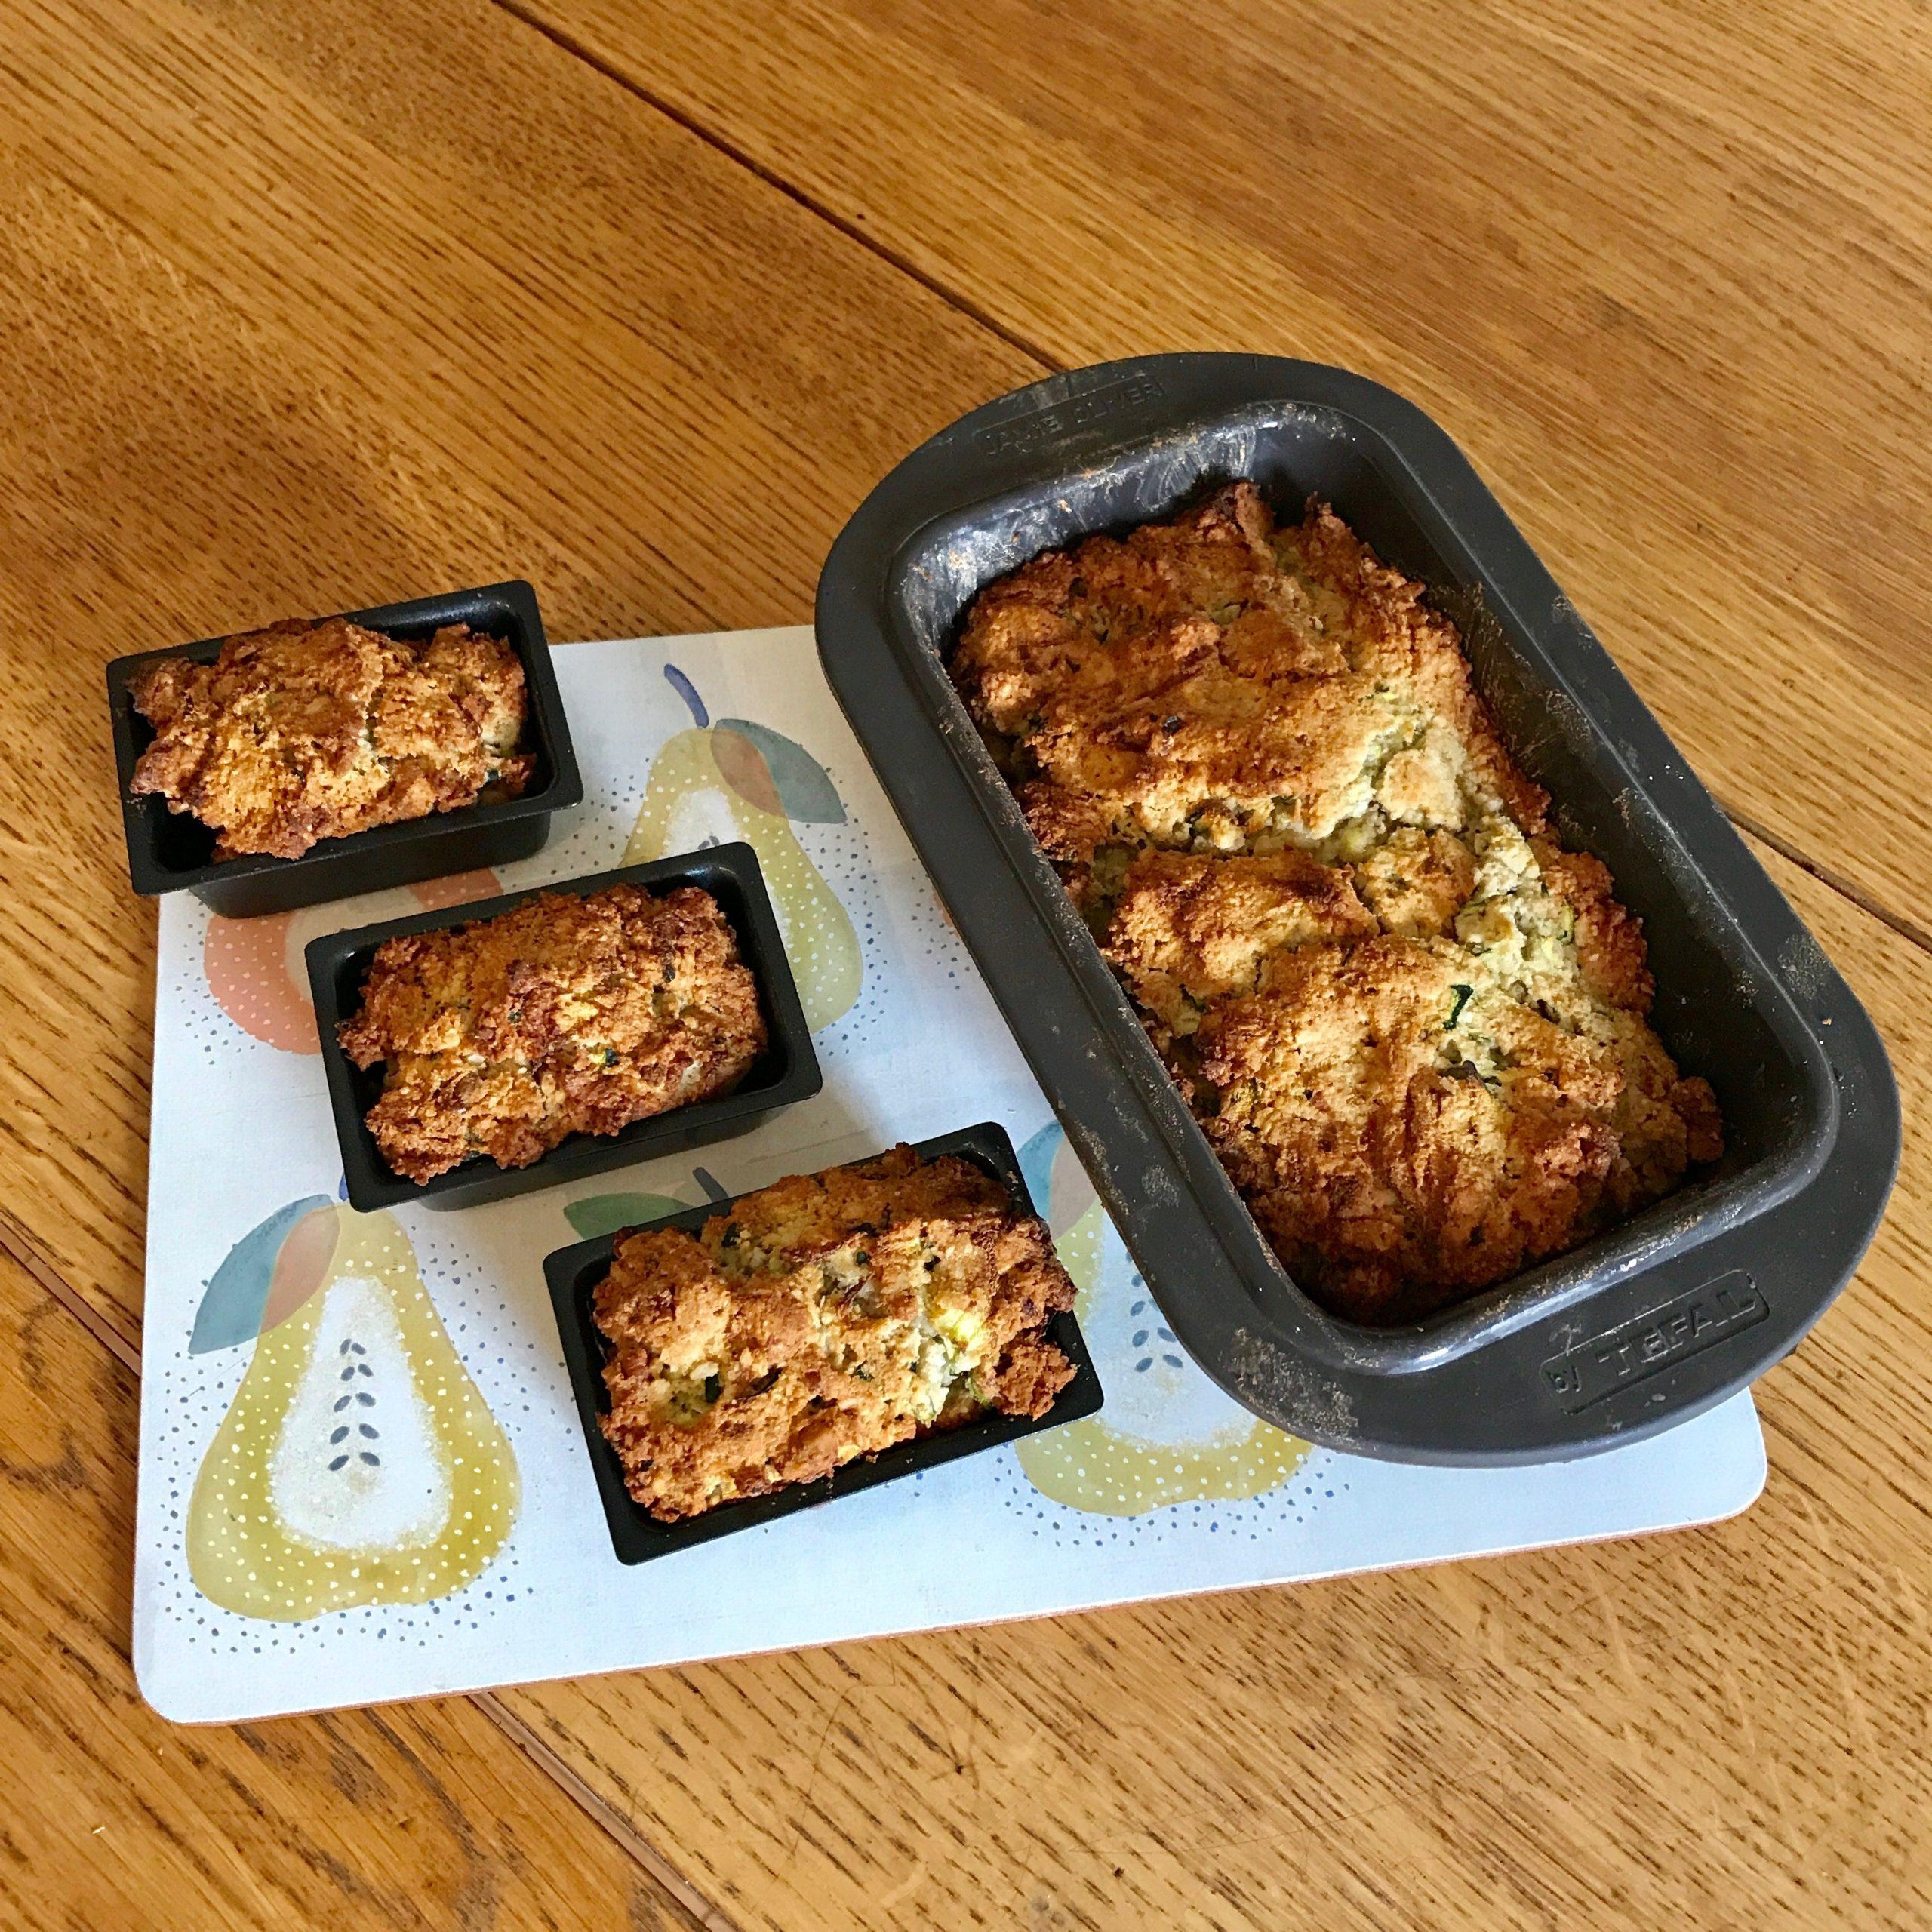 My Sister's Zucchini Bread – Scrumptious!